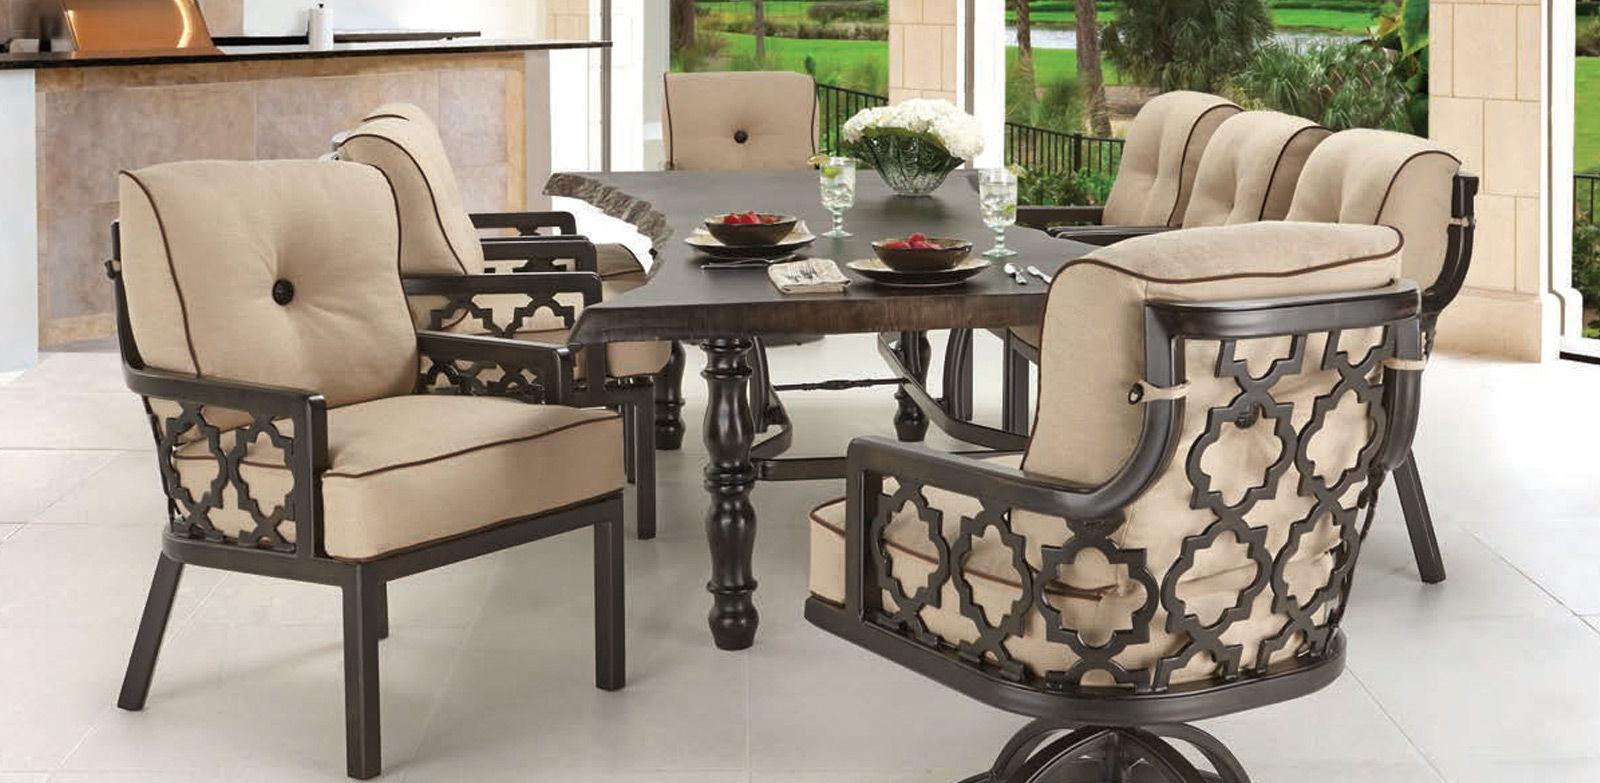 Belle Epoque Collection In Costa Rica | Costa Rica Furniture   Custom Made  Furniture